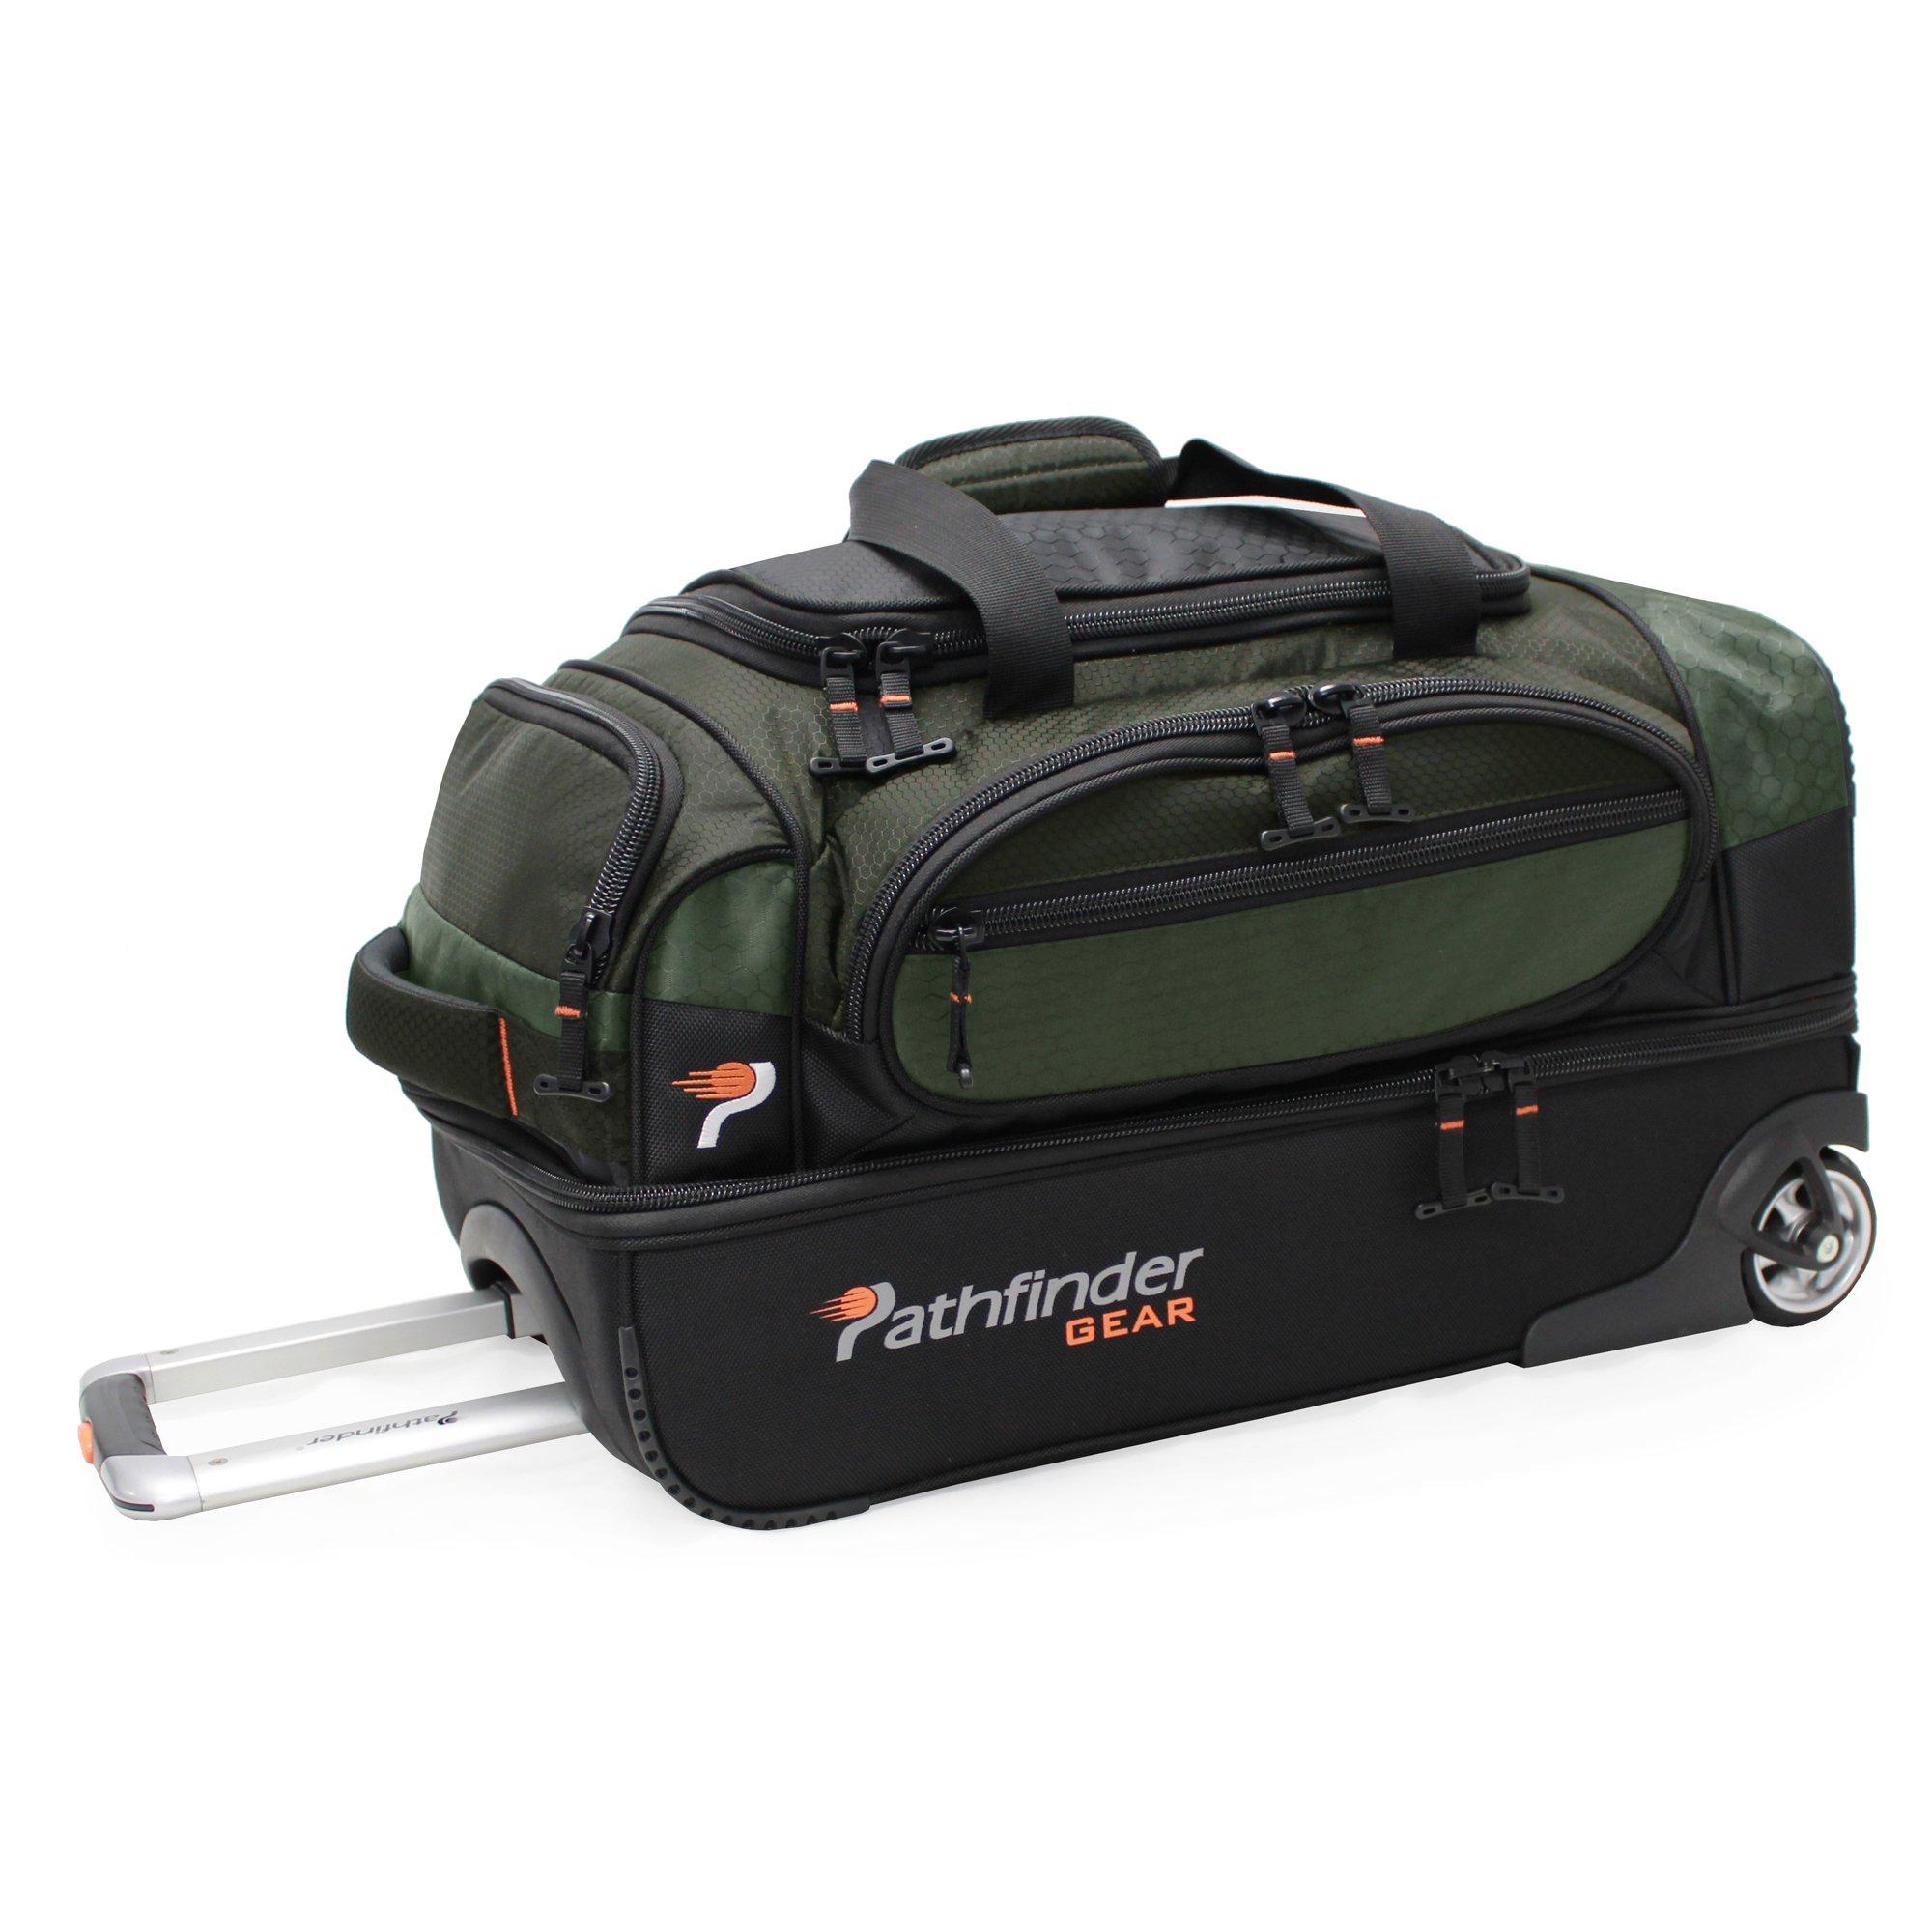 Pathfinder Gear 22 Inch Rolling Drop Bottom Duffel, Olive, One Size